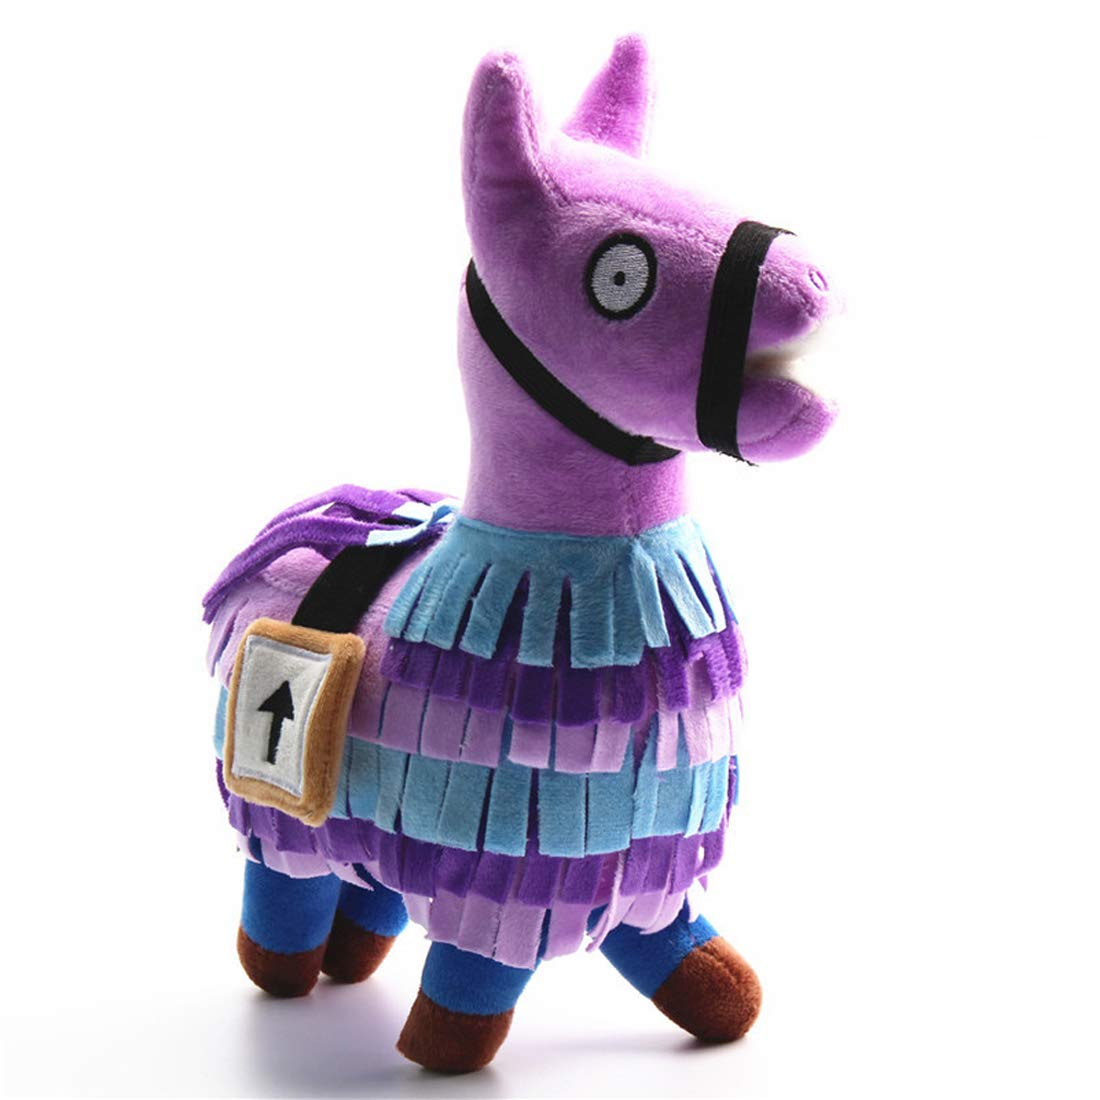 Loot Llama Plush Toys Loot Supply Gamer Gifts Reward, Gaming Alpaca Treasure Box 25cm Collectible for Kids and Adults Qukueoy